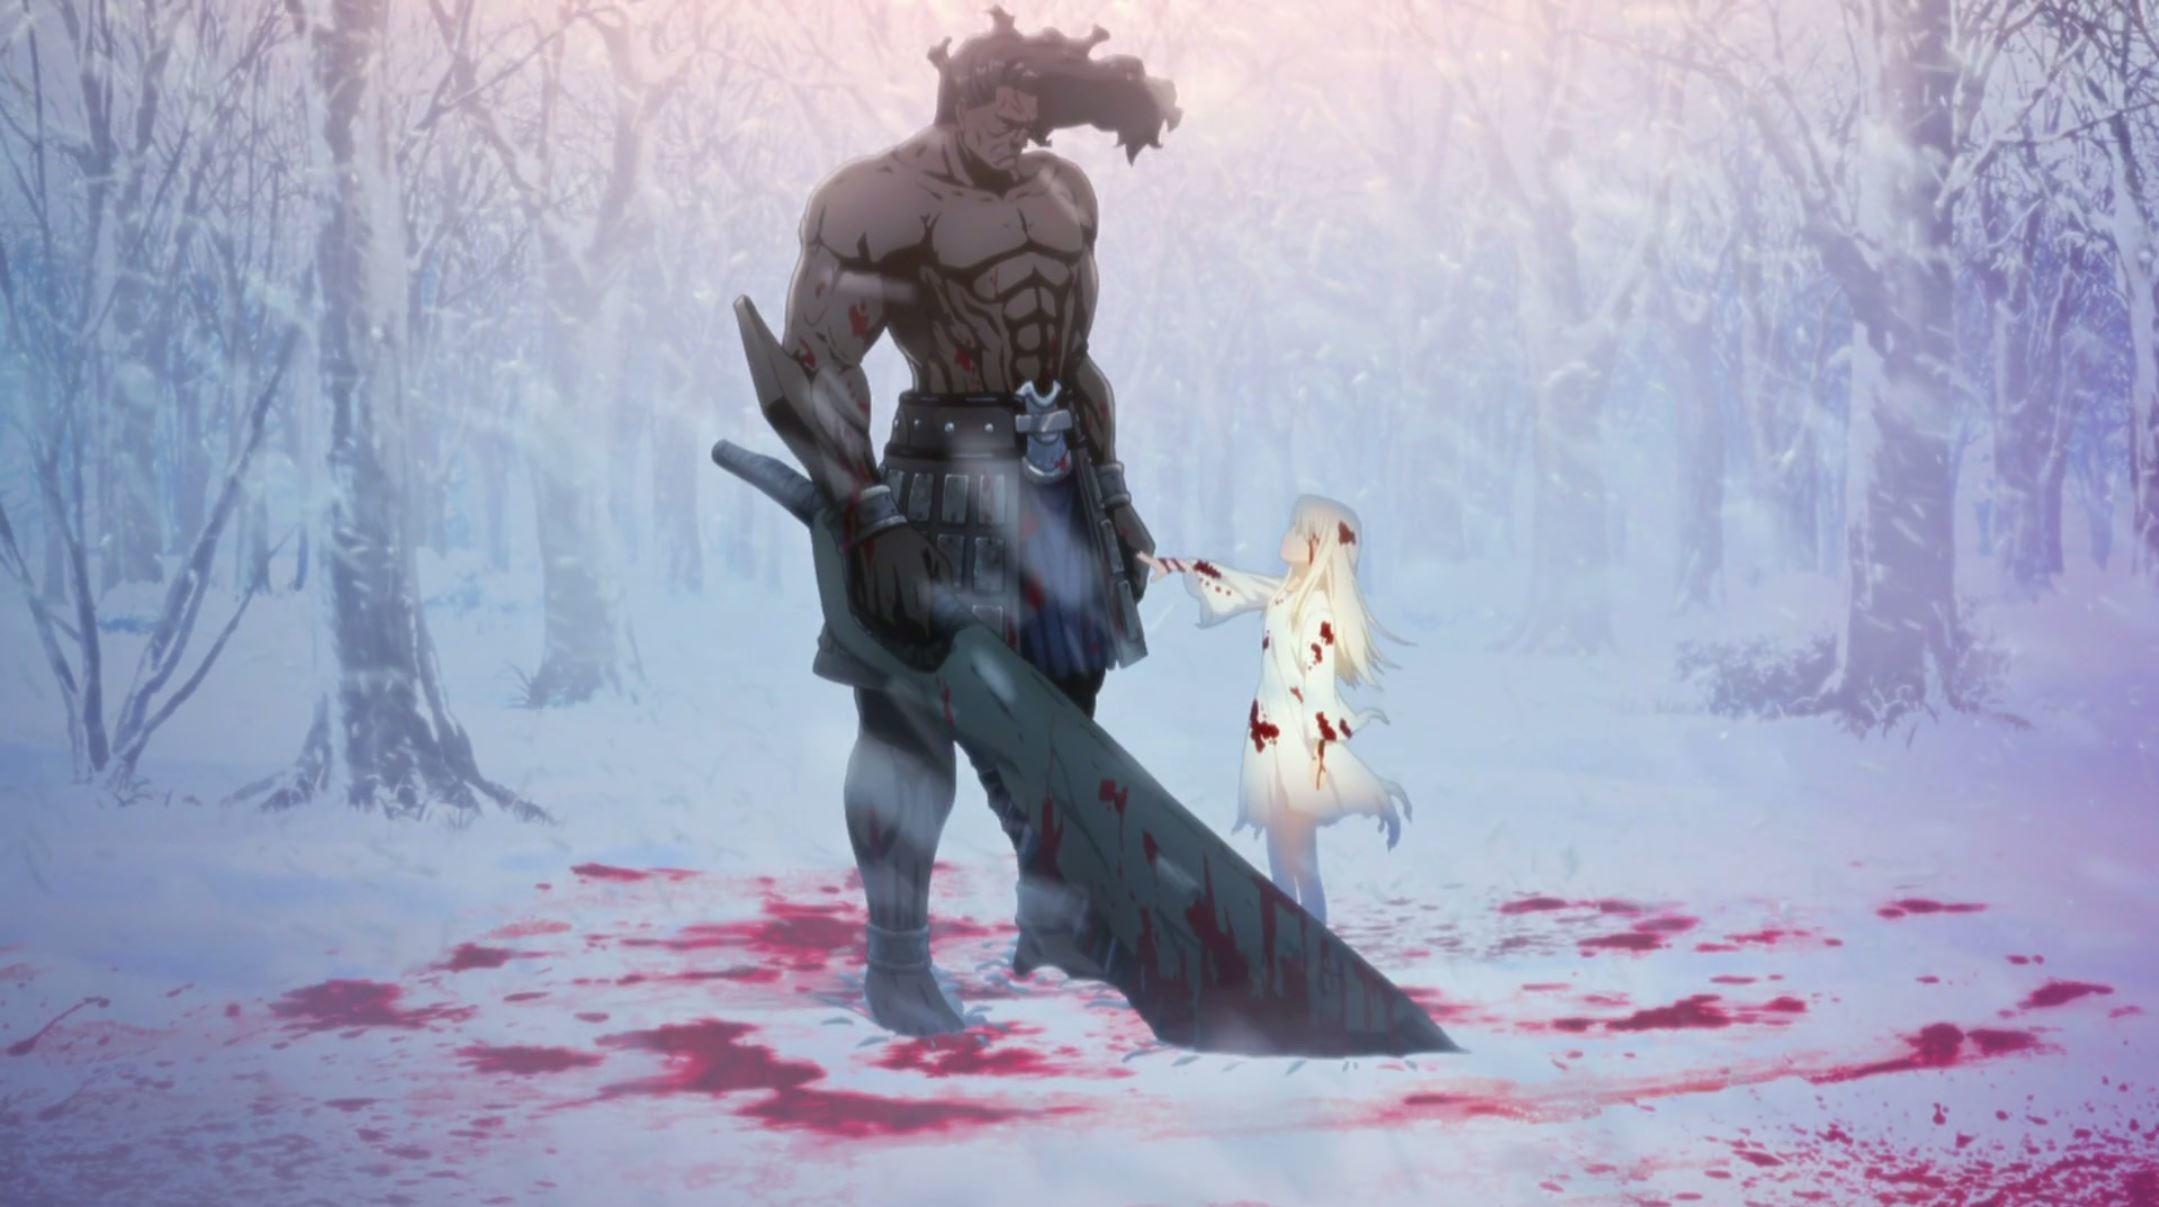 Fond d'écran HD | Arrière-plan ID:644859. Anime Fate/Stay Night: Unlimited  Blade Works